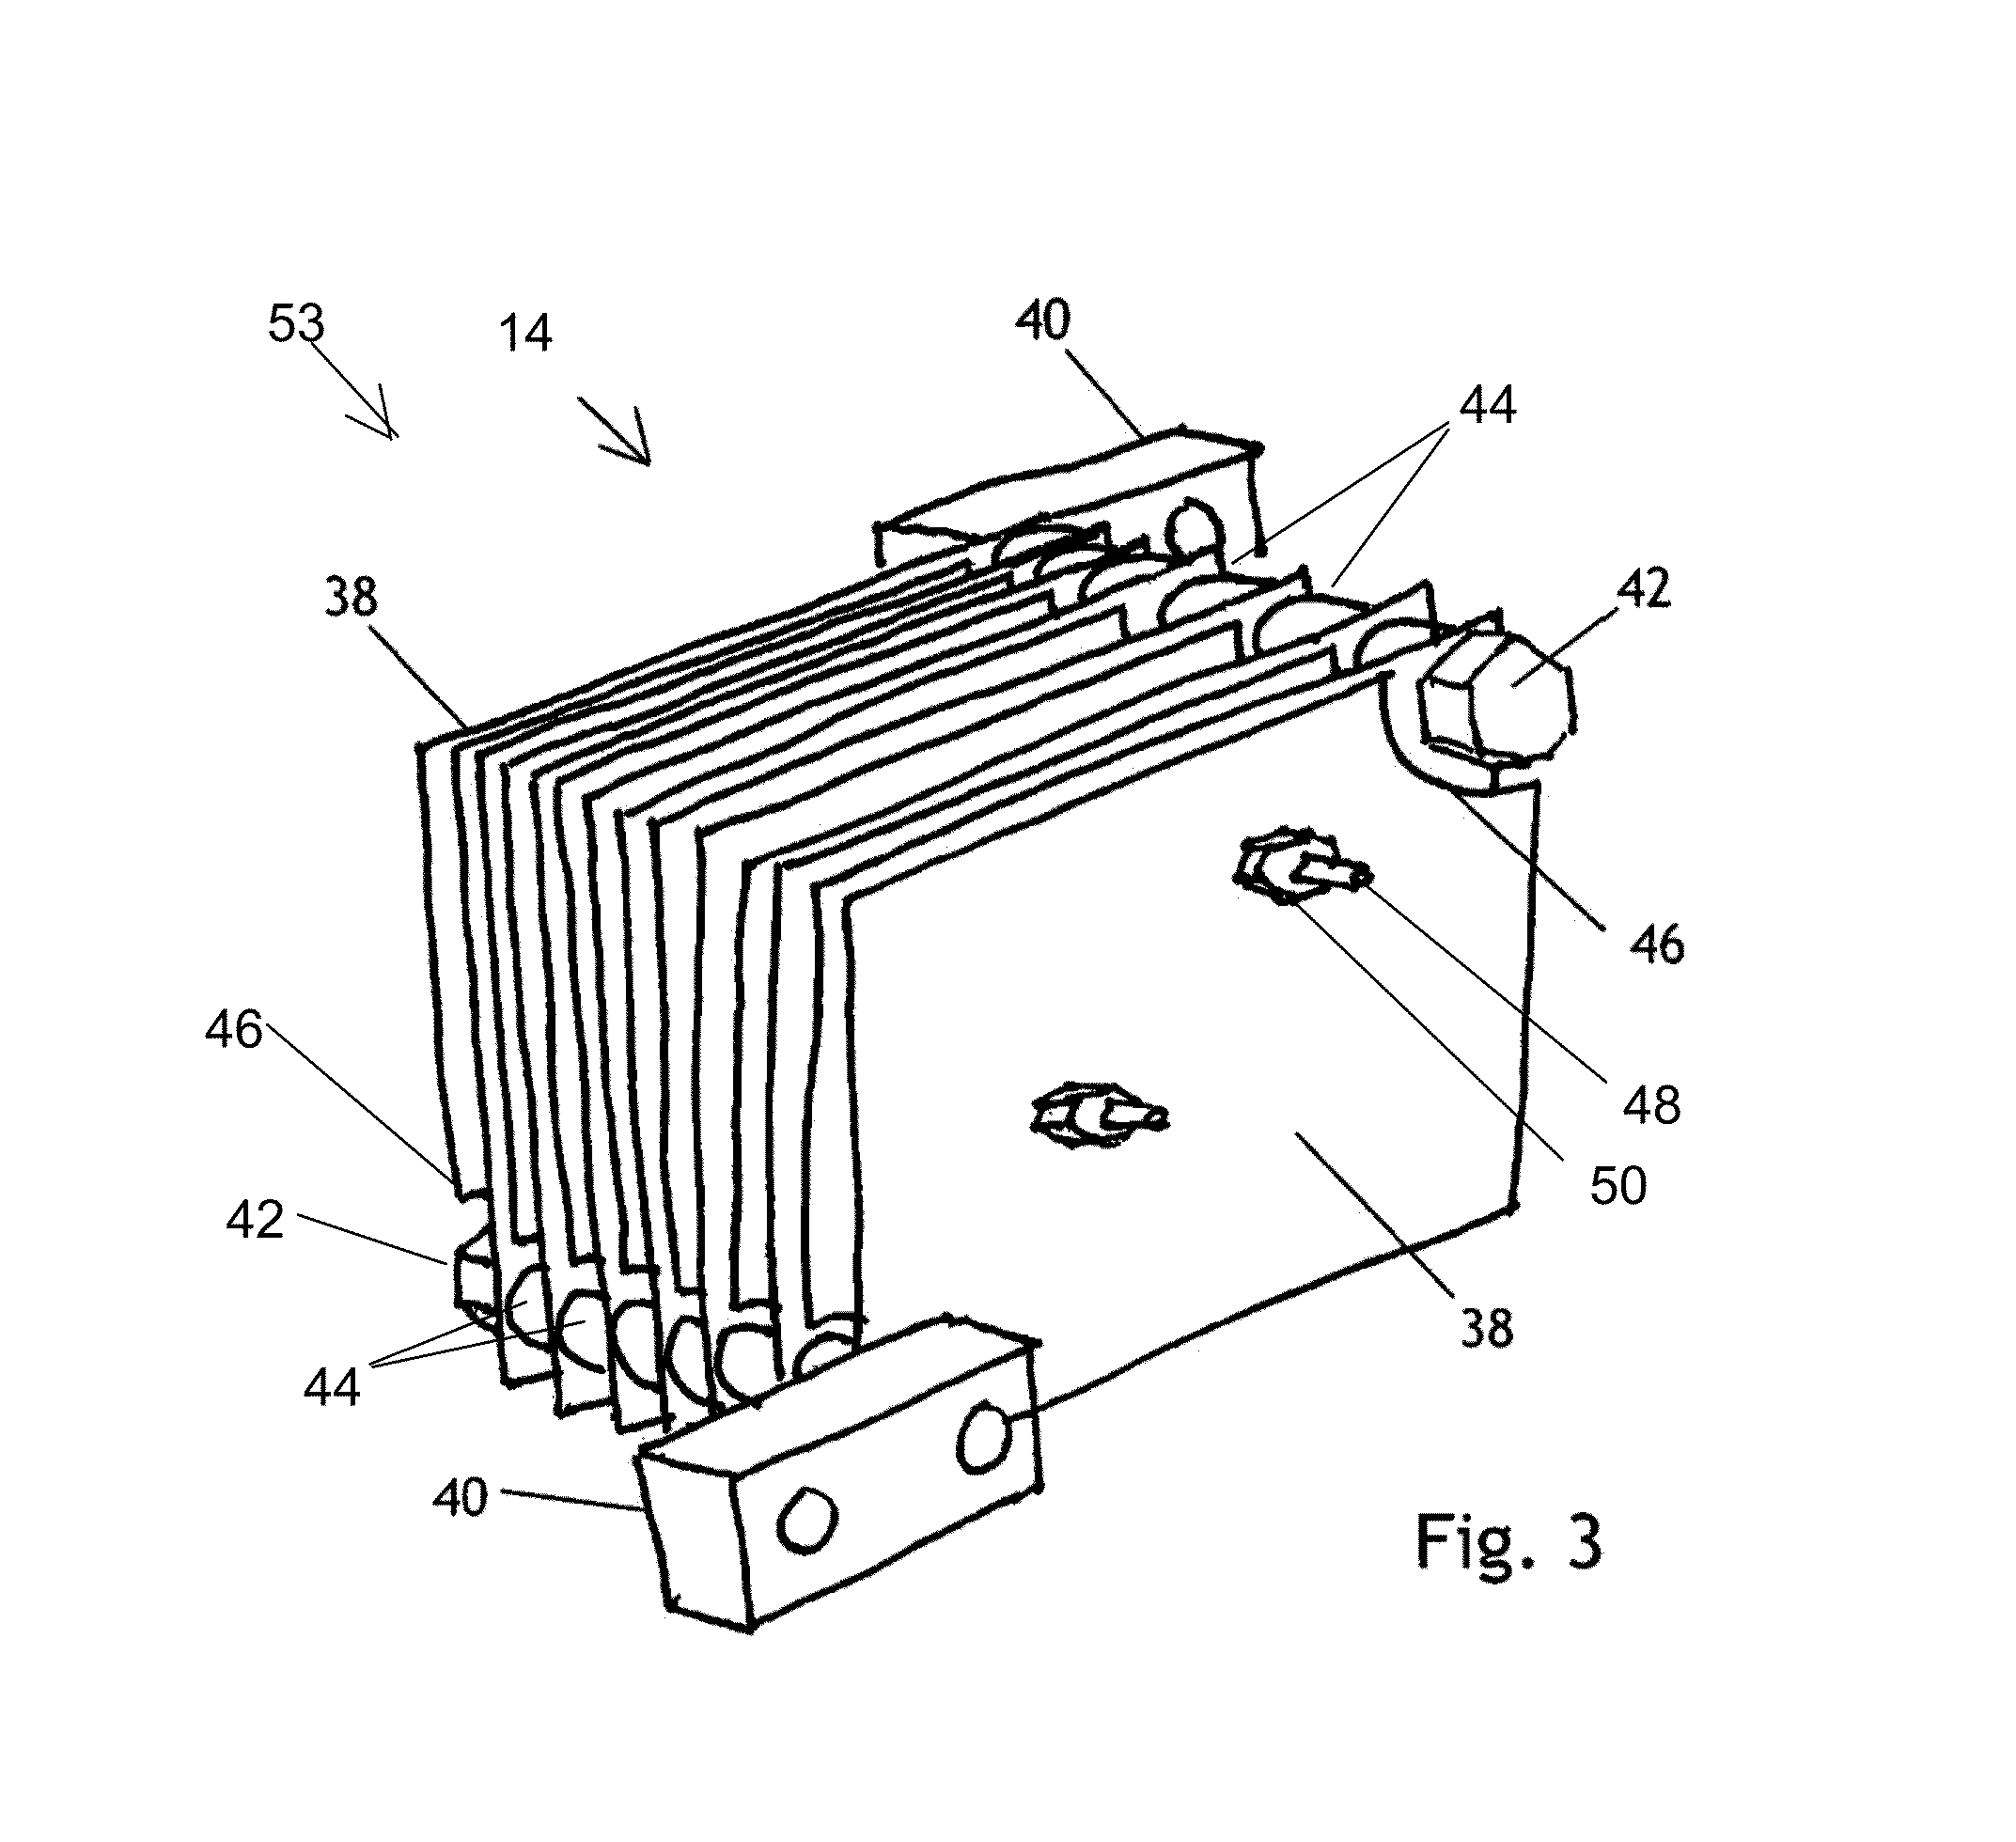 Wiring Diagram Hydrogen Generator : Patent us electrolytic hydrogen generator and